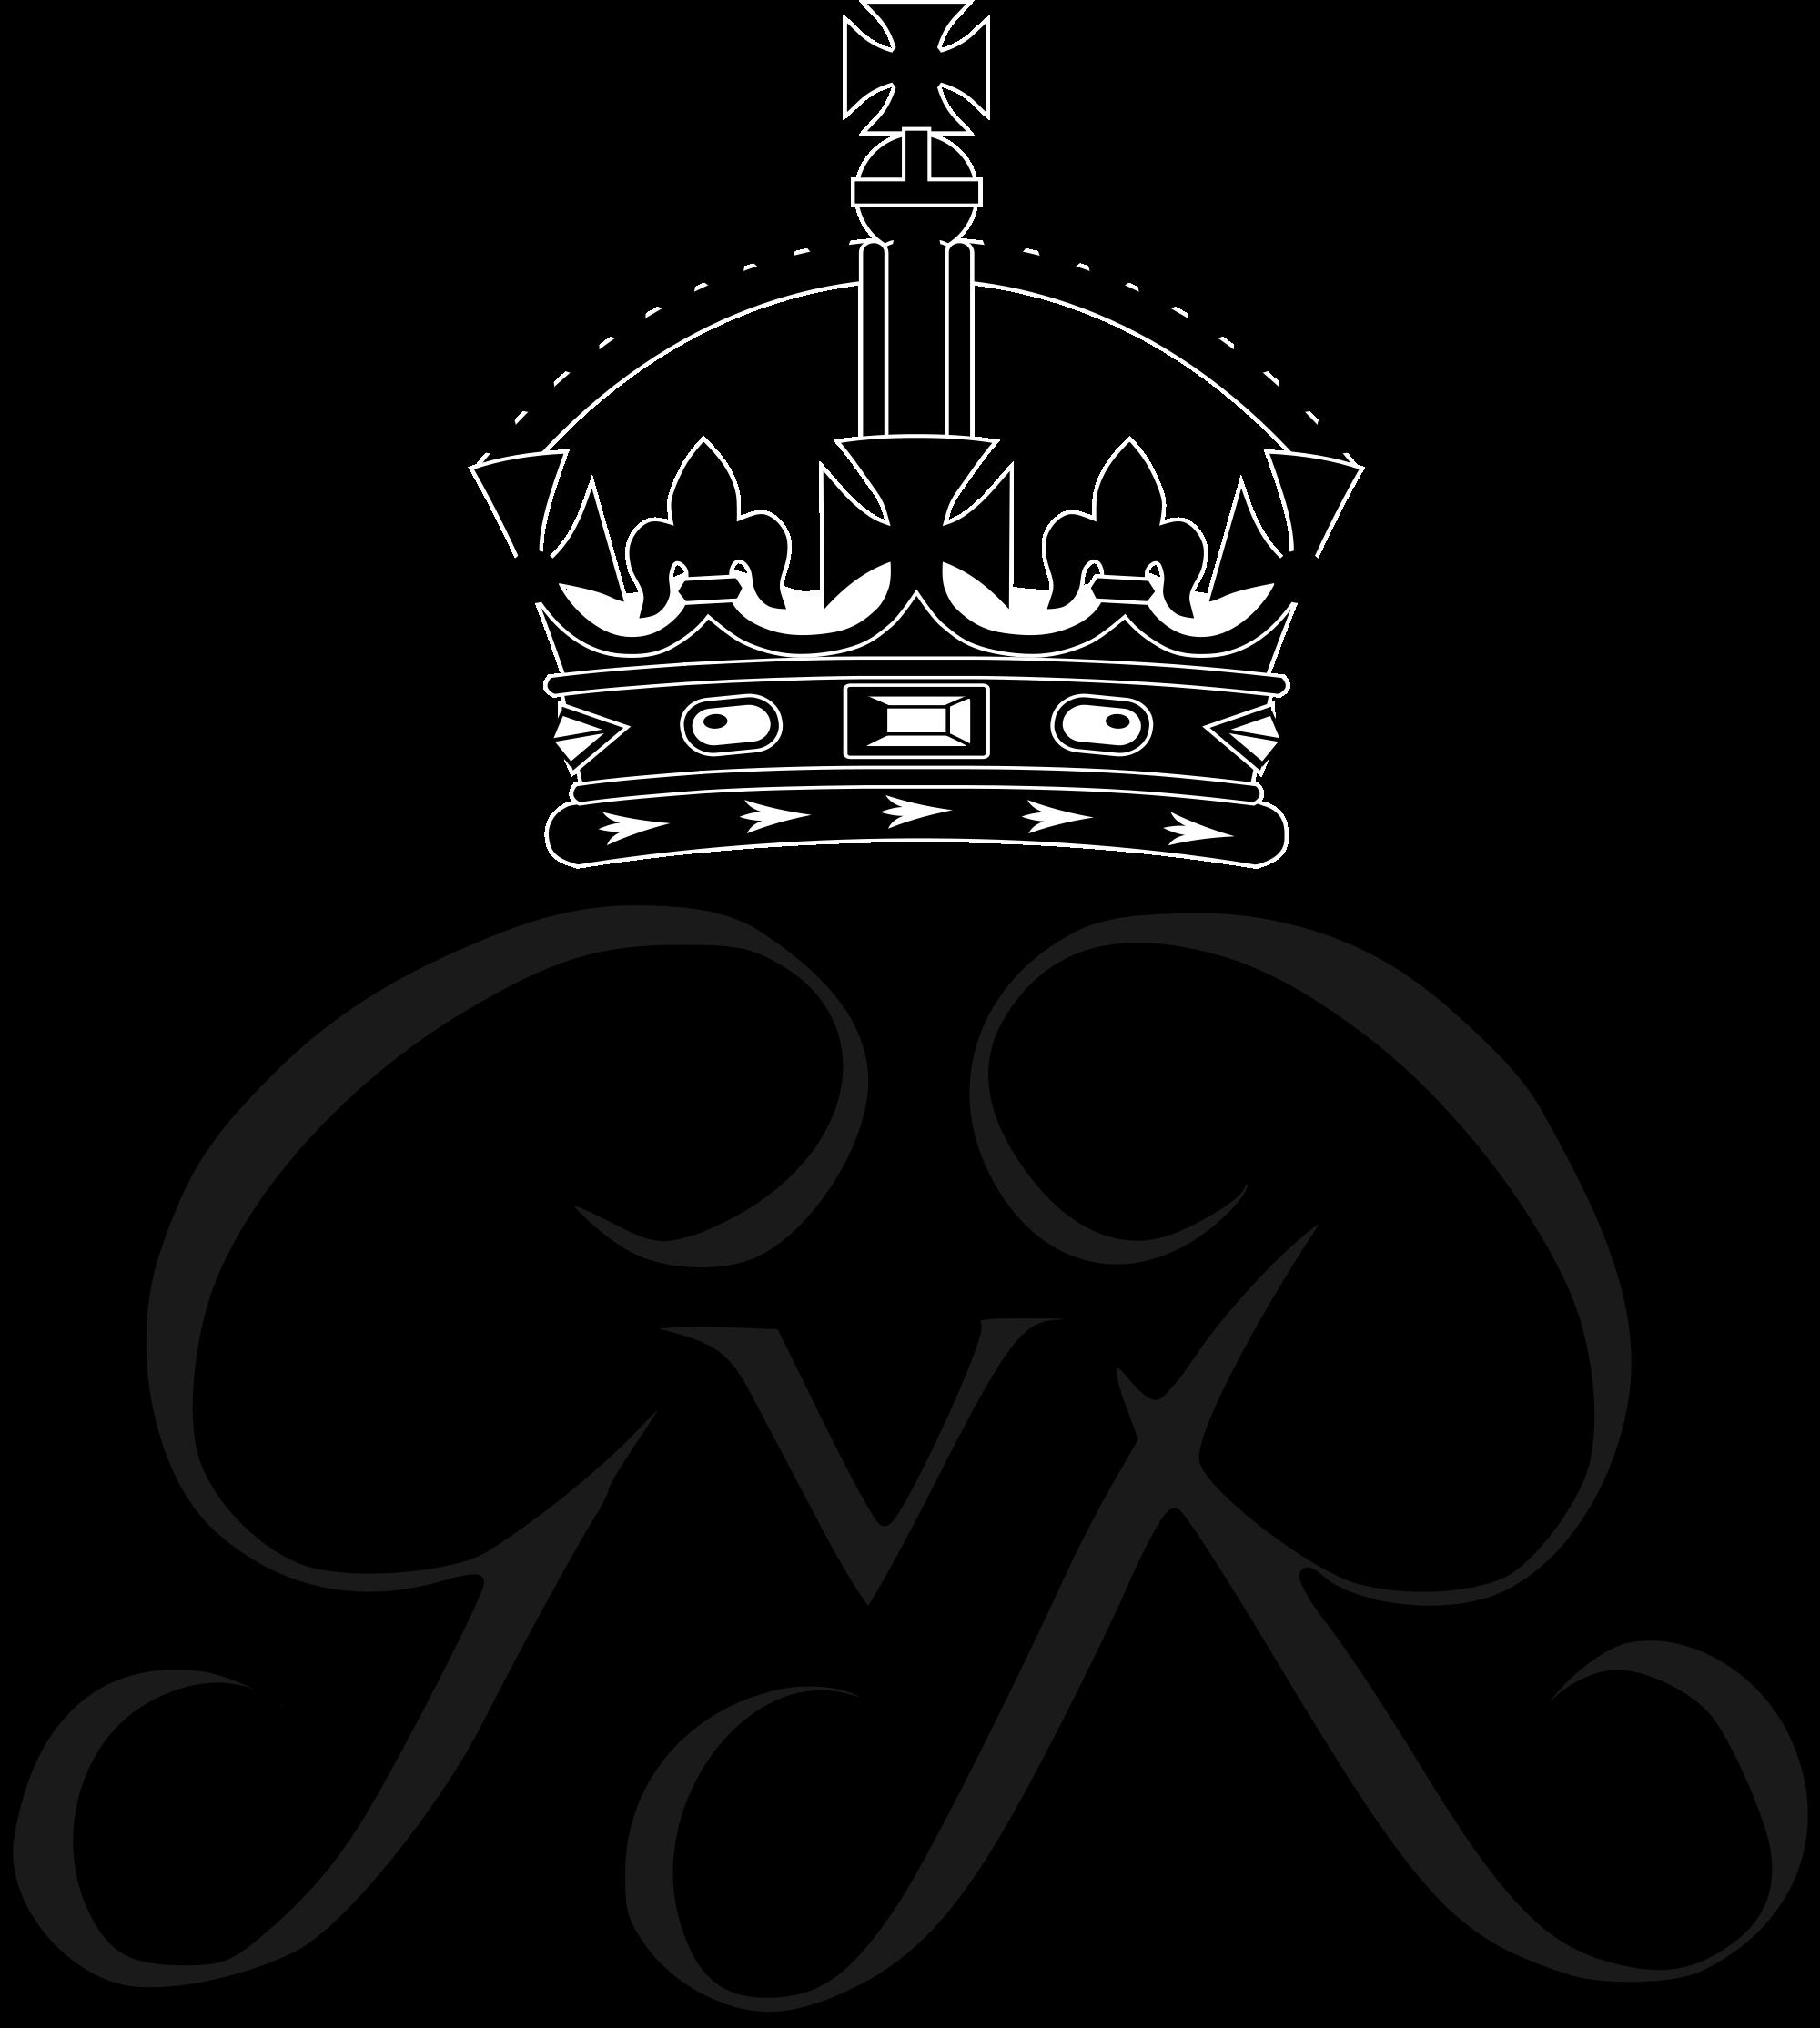 File:Royal Monogram of King George V of Great Britain.svg.